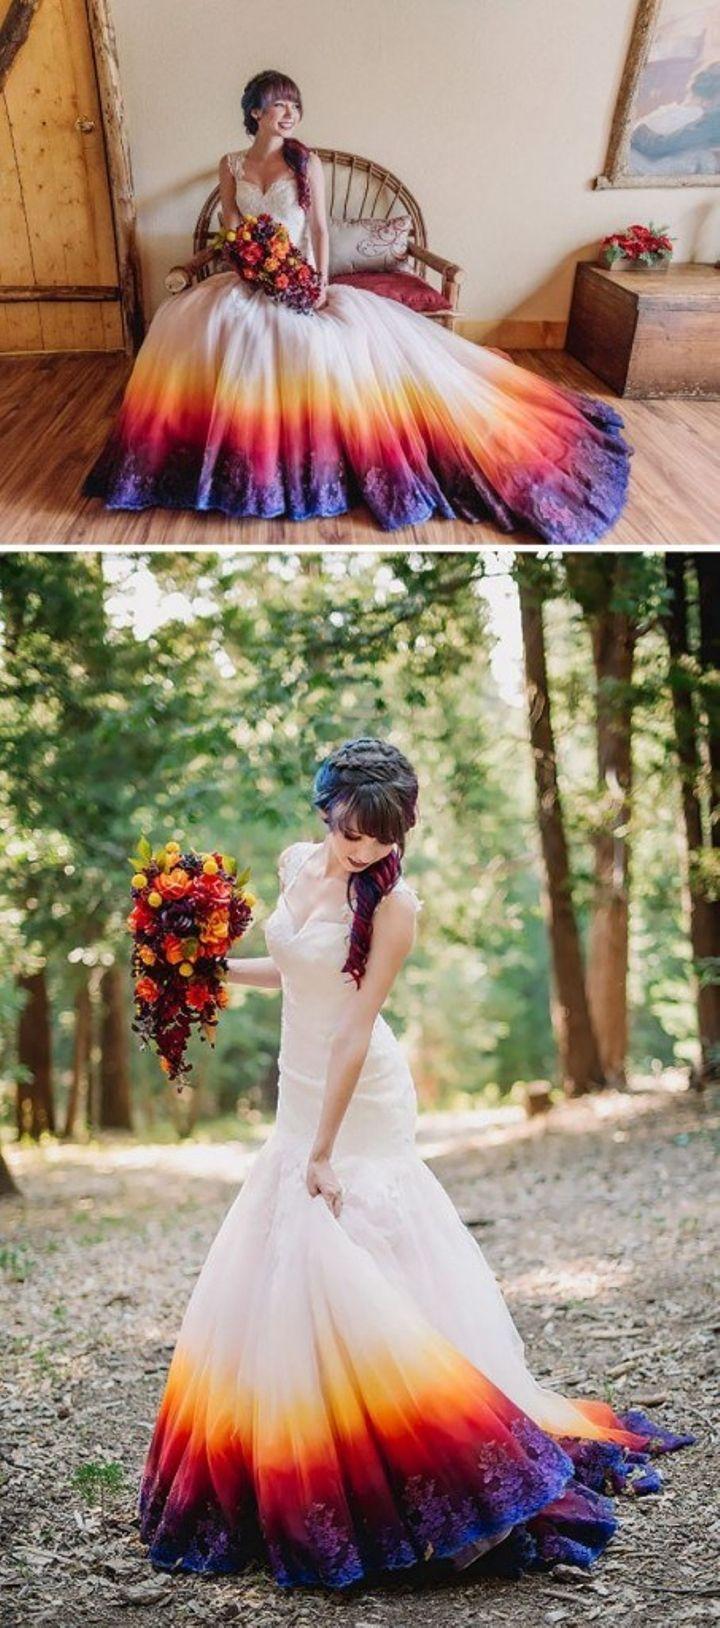 fairy wedding dress fairy wedding dress 25 Best Ideas about Fairy Wedding Dress on Pinterest Whimsical style weddings Woodland fairy costume and Woodland fairy